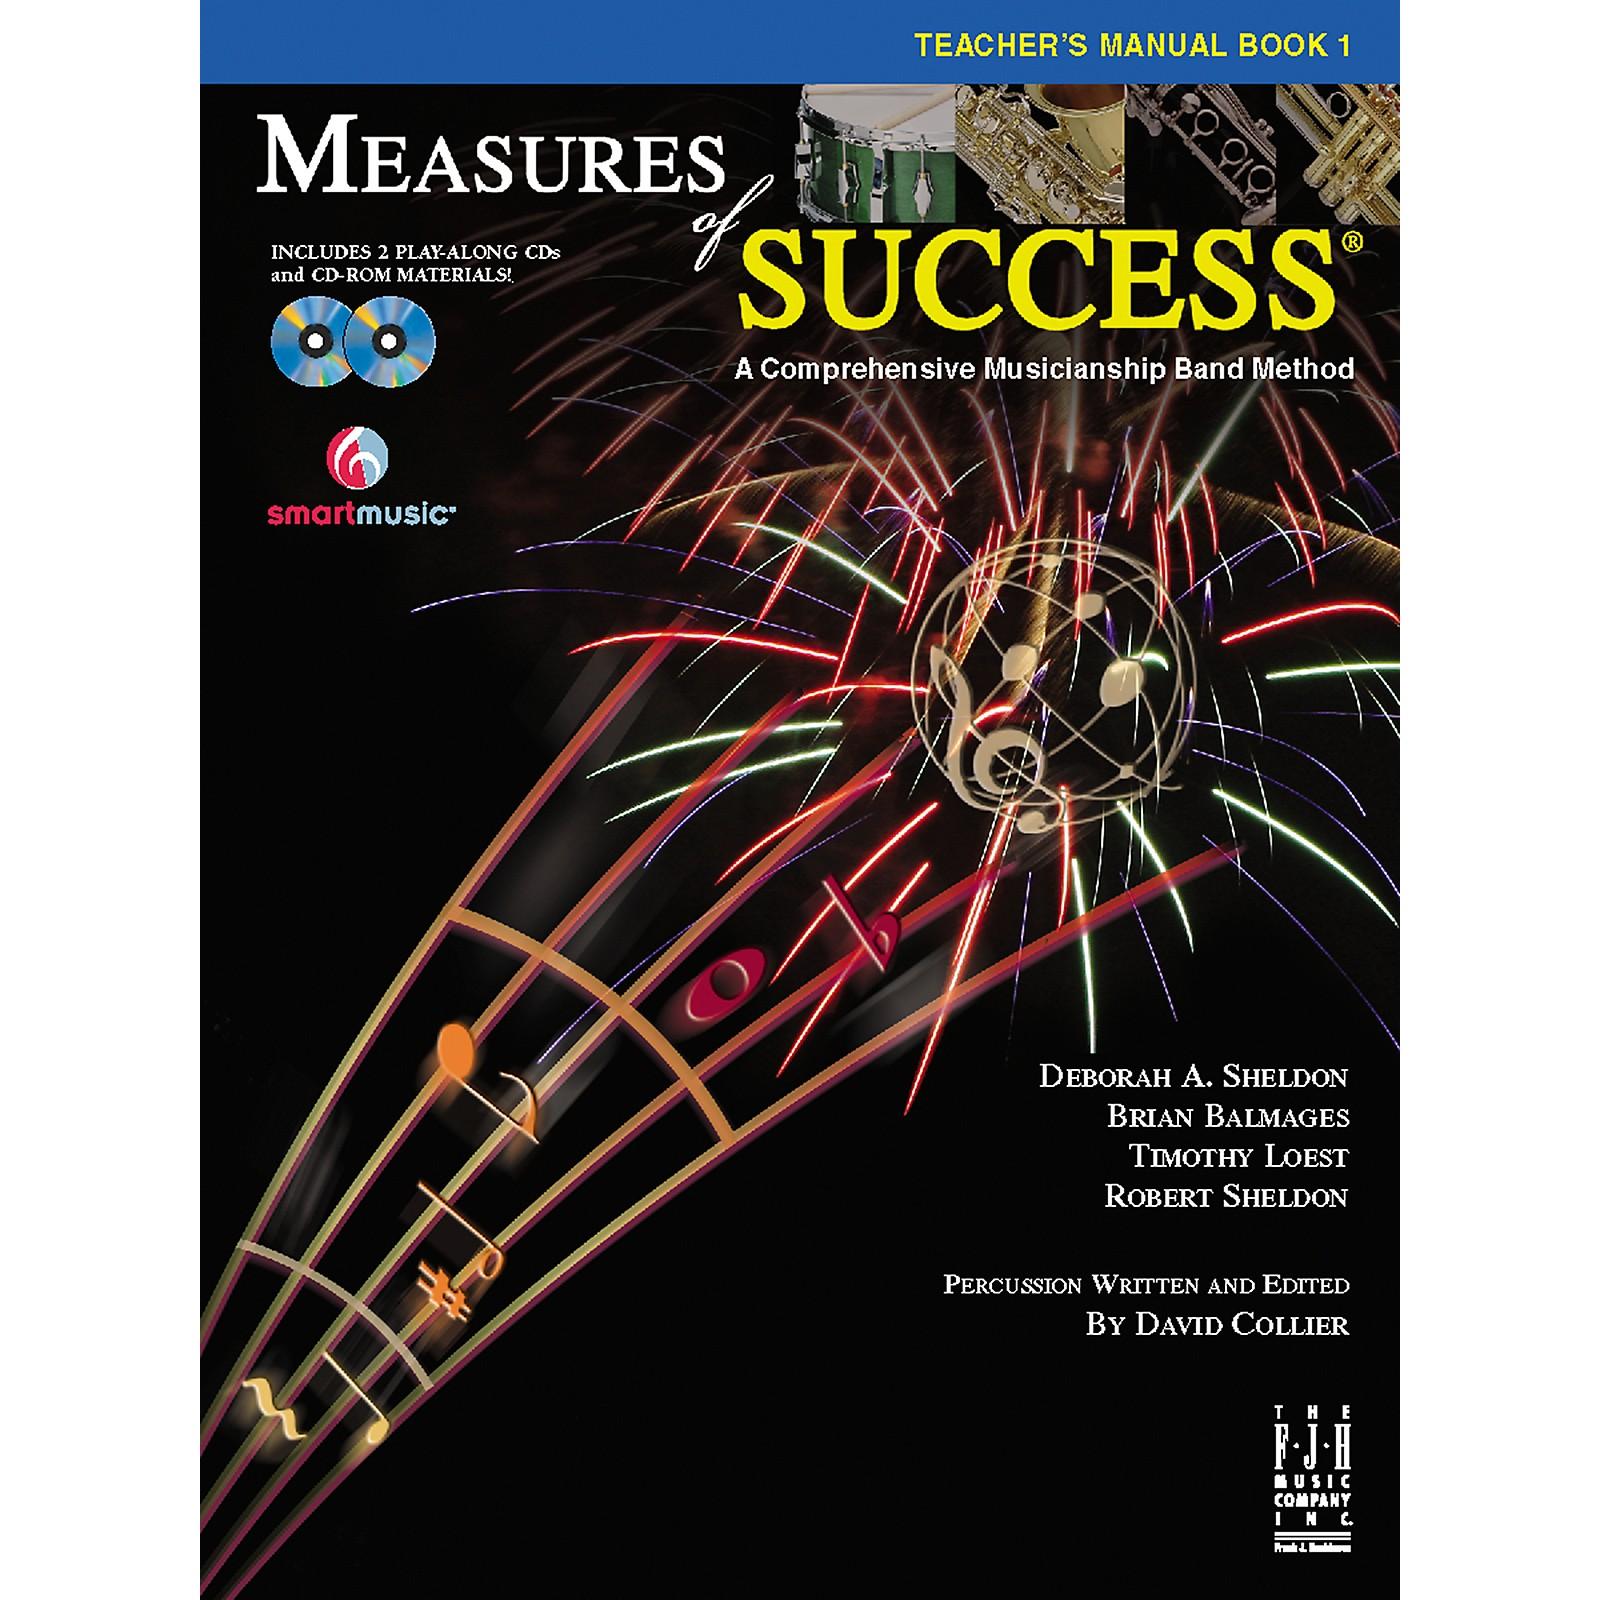 FJH Music Measures of Success Teacher's Manual Book 1